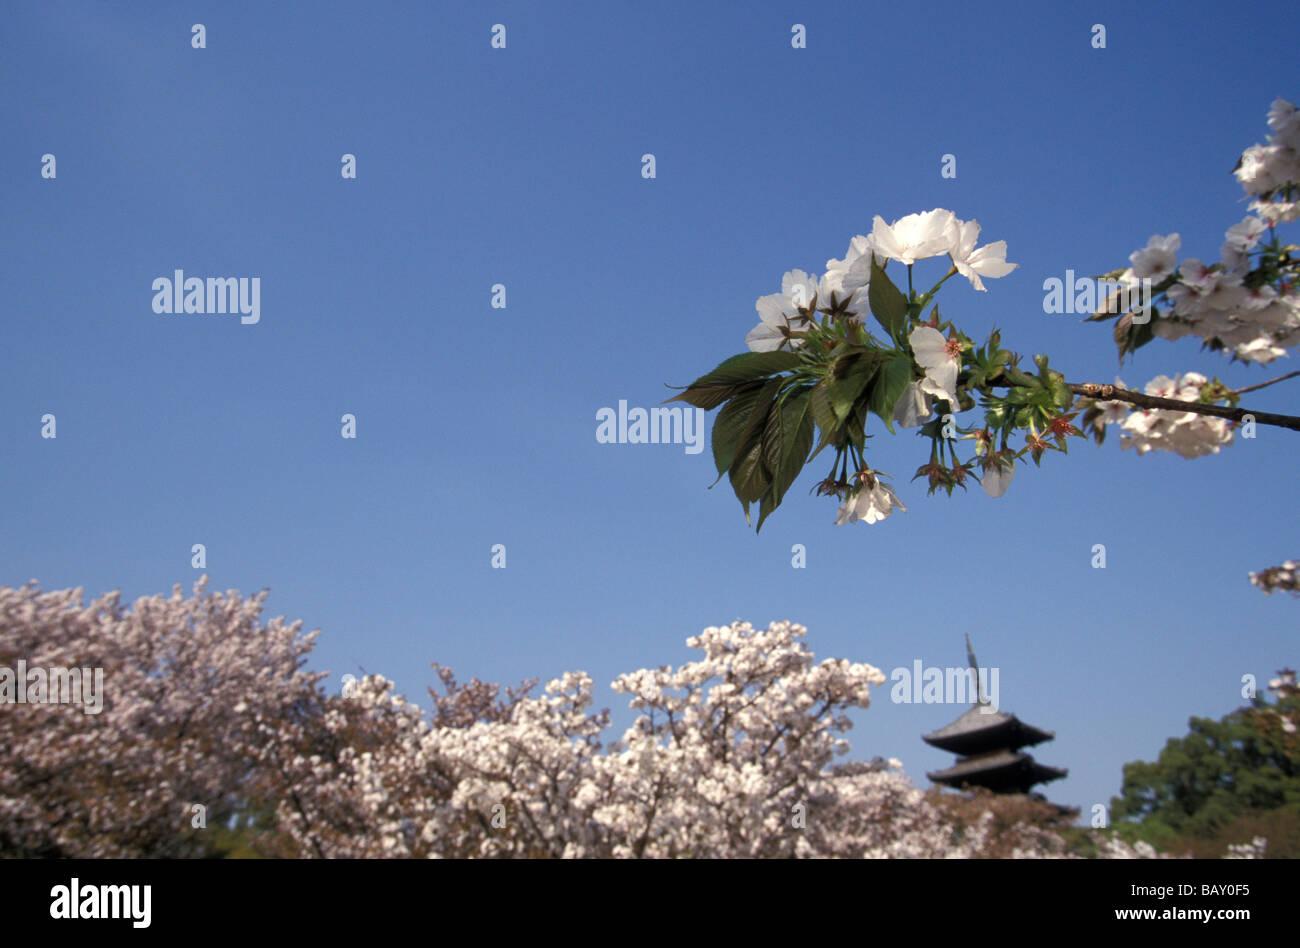 Kirschbluete, Sakura, Kyoto Japan - Stock Image